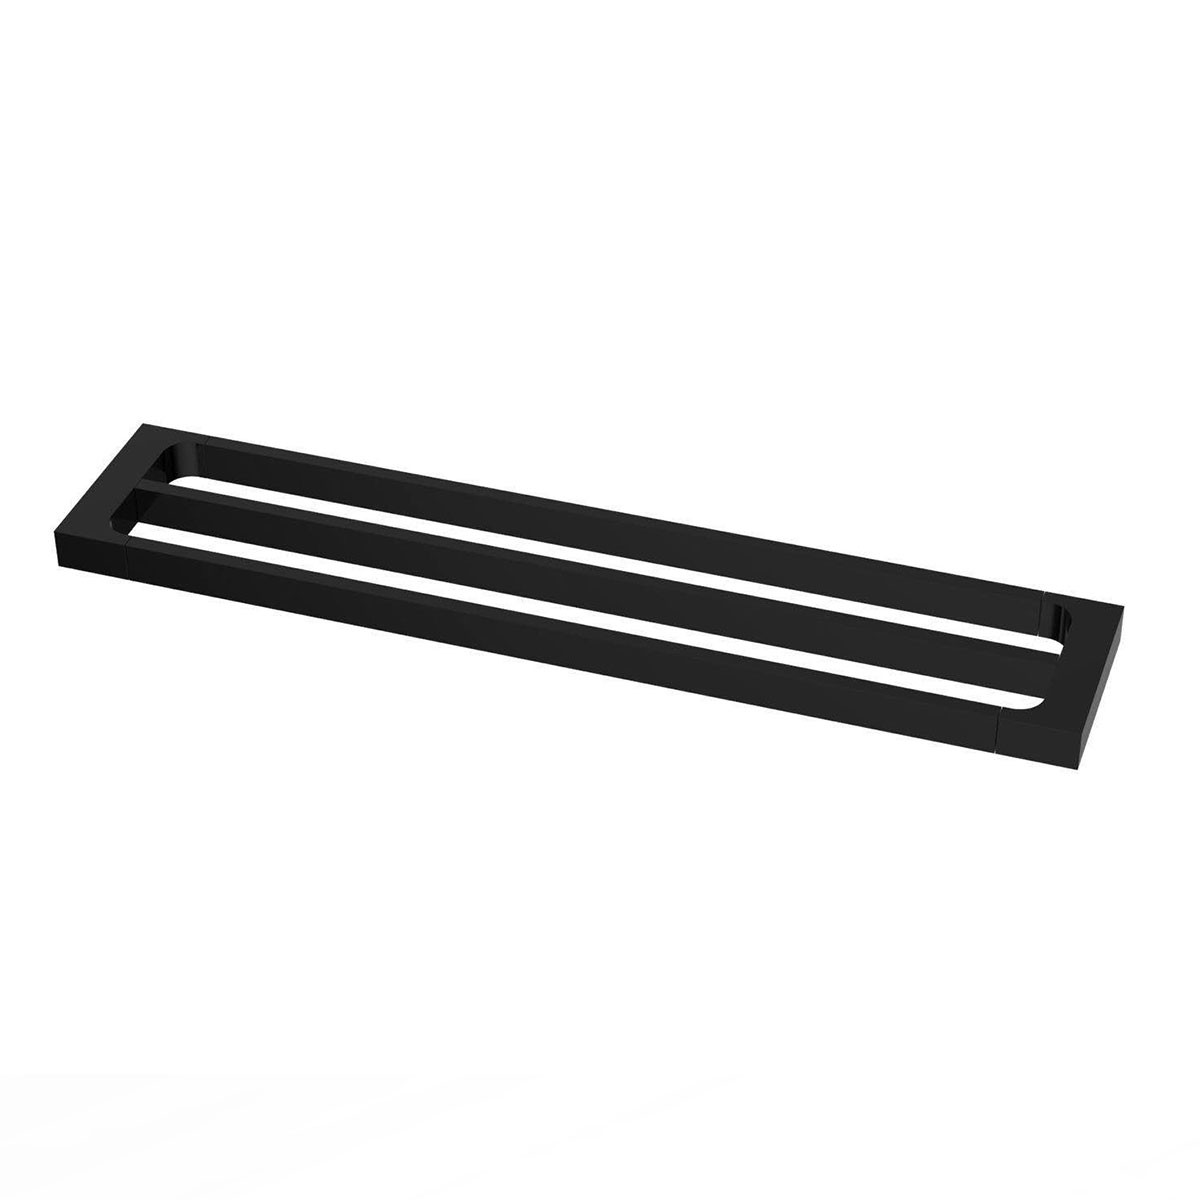 Towel Bar 23.6 Inch - Matte Black Brass (OD03611B)